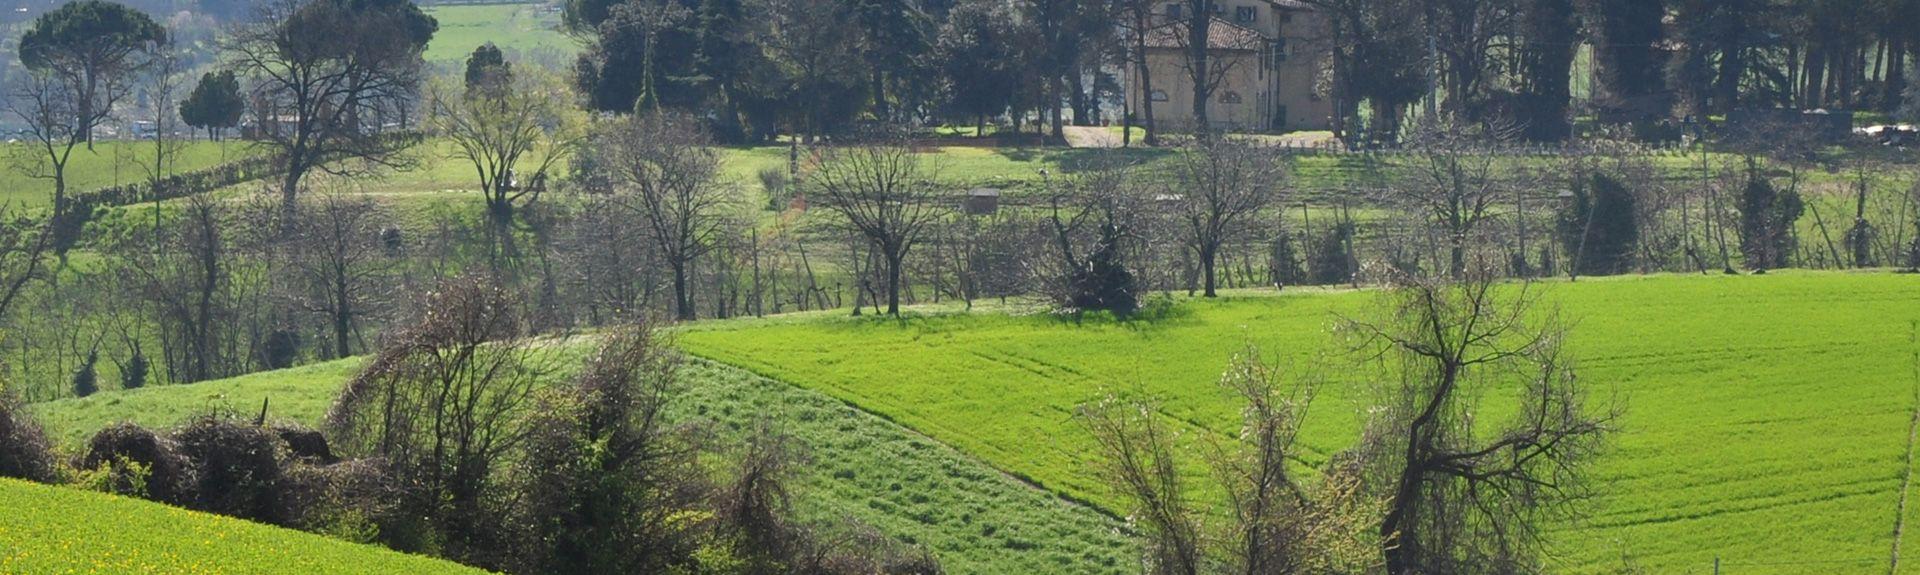 Imola, Emilia-Romaña, Italia